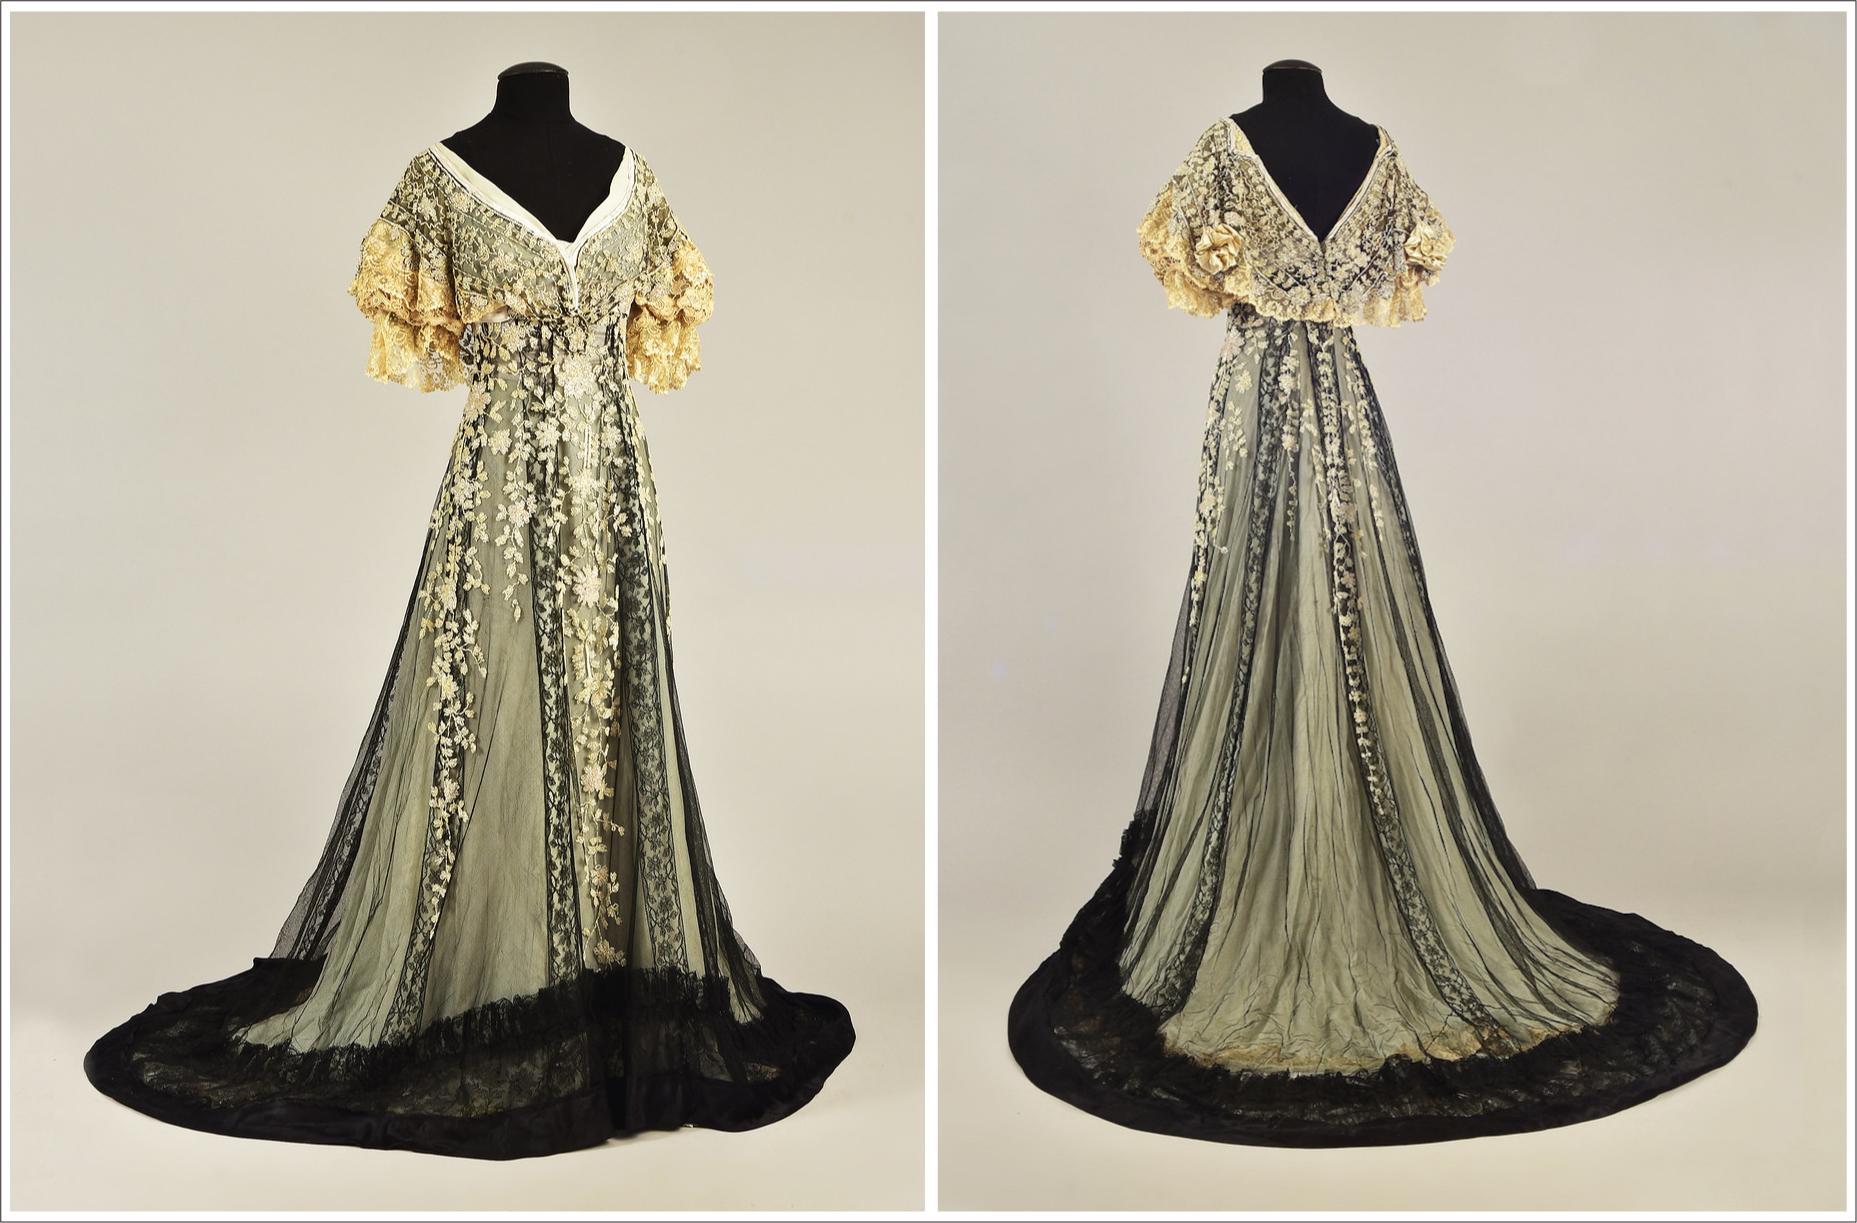 Ca. 1907 Dress Of Consuelo Vanderbilt Attributed To Callot